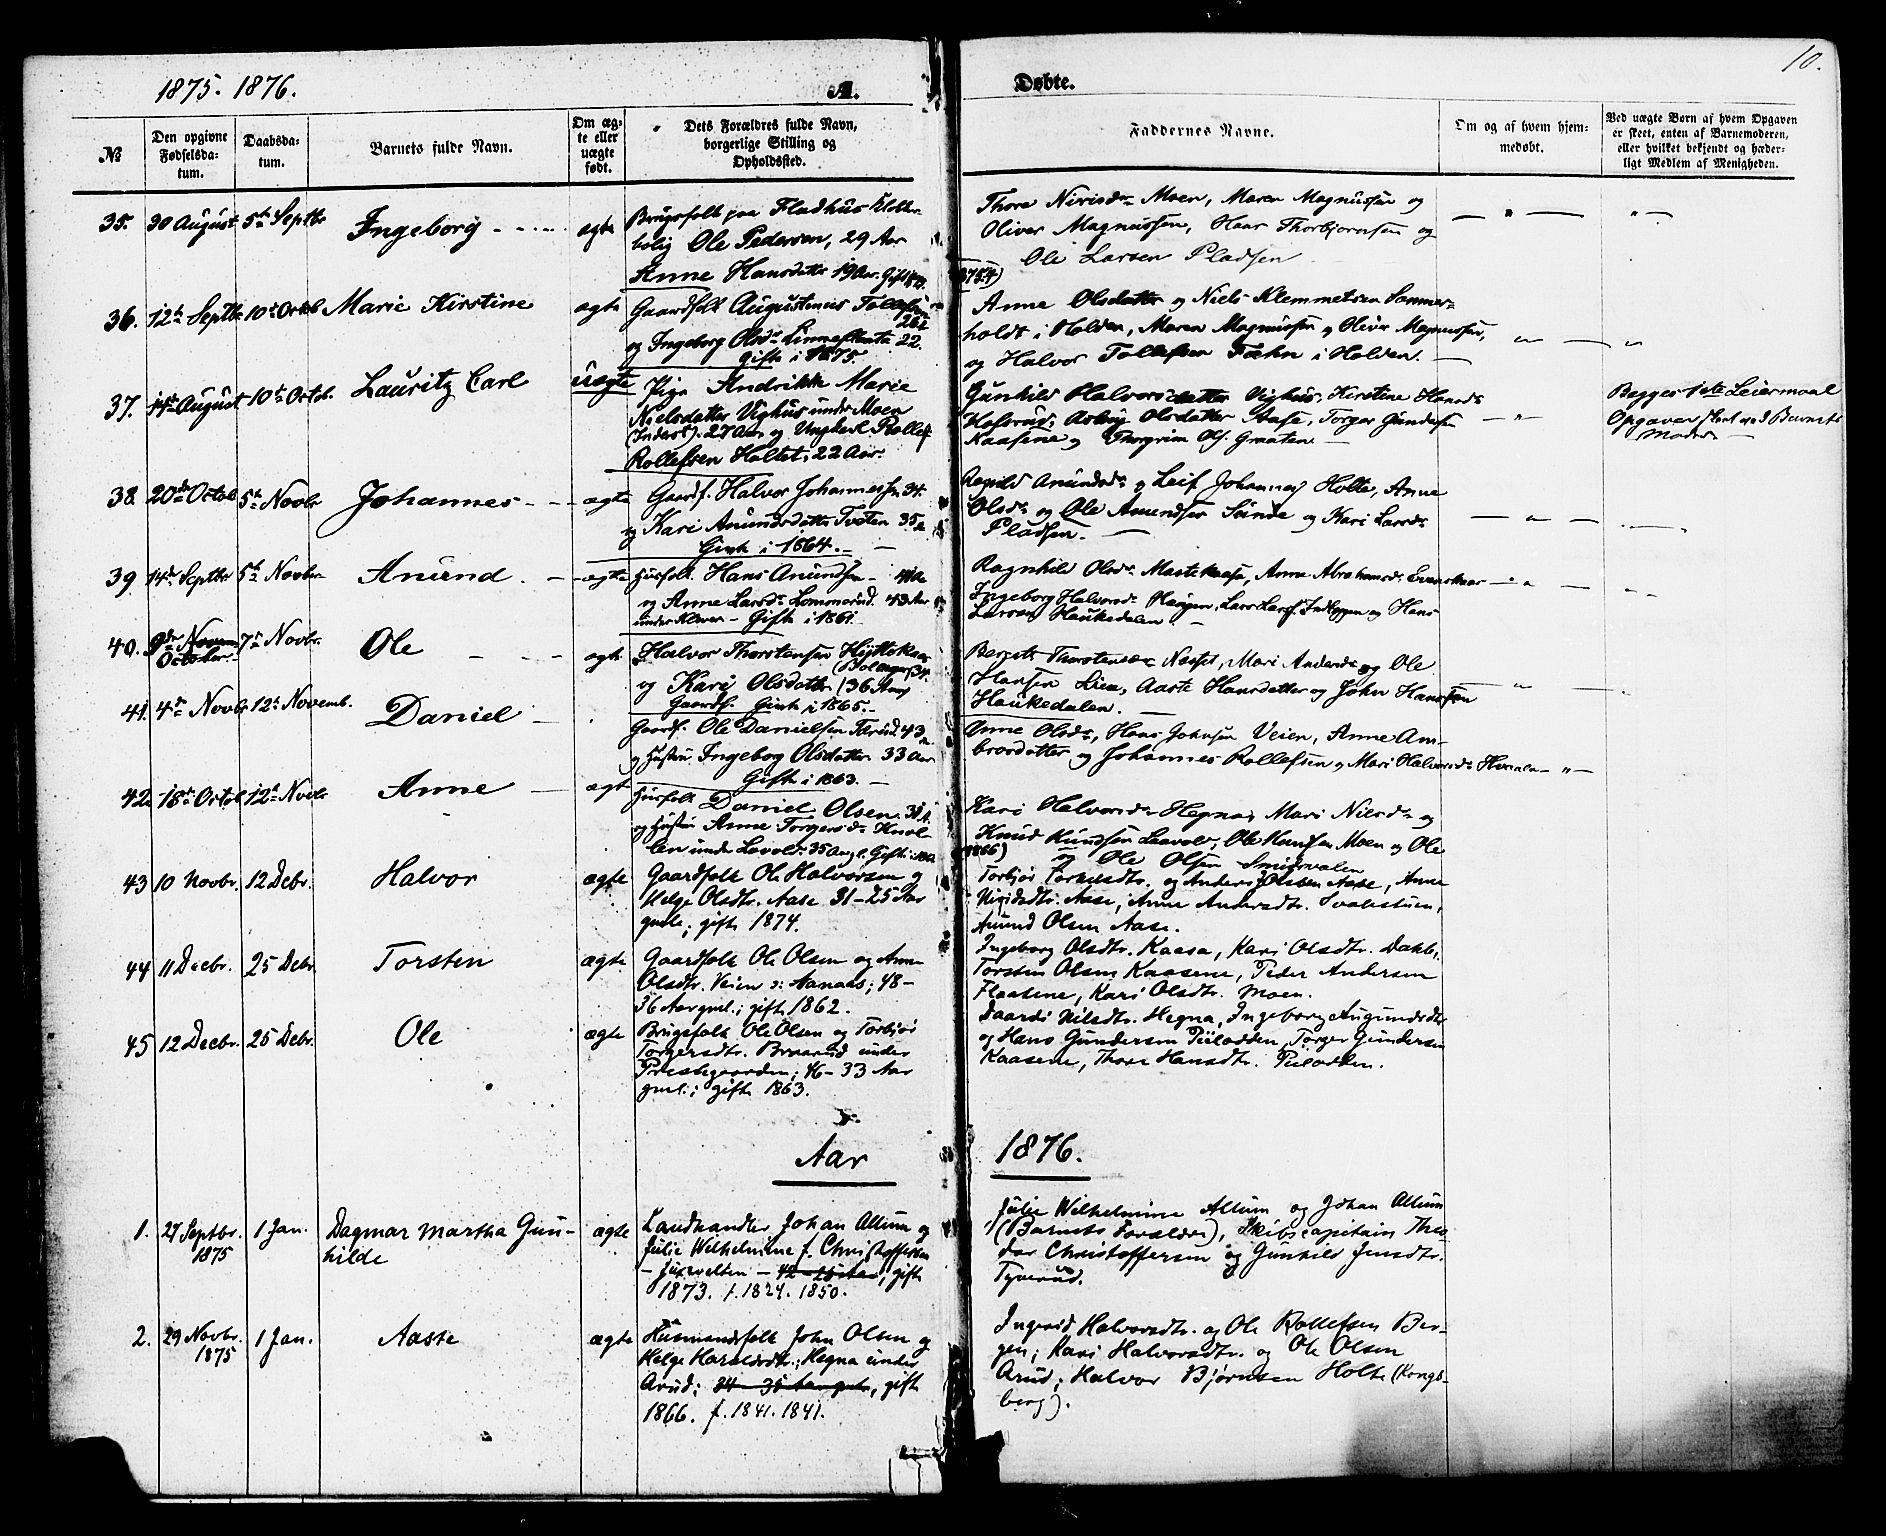 SAKO, Sauherad kirkebøker, F/Fa/L0008: Ministerialbok nr. I 8, 1873-1886, s. 10